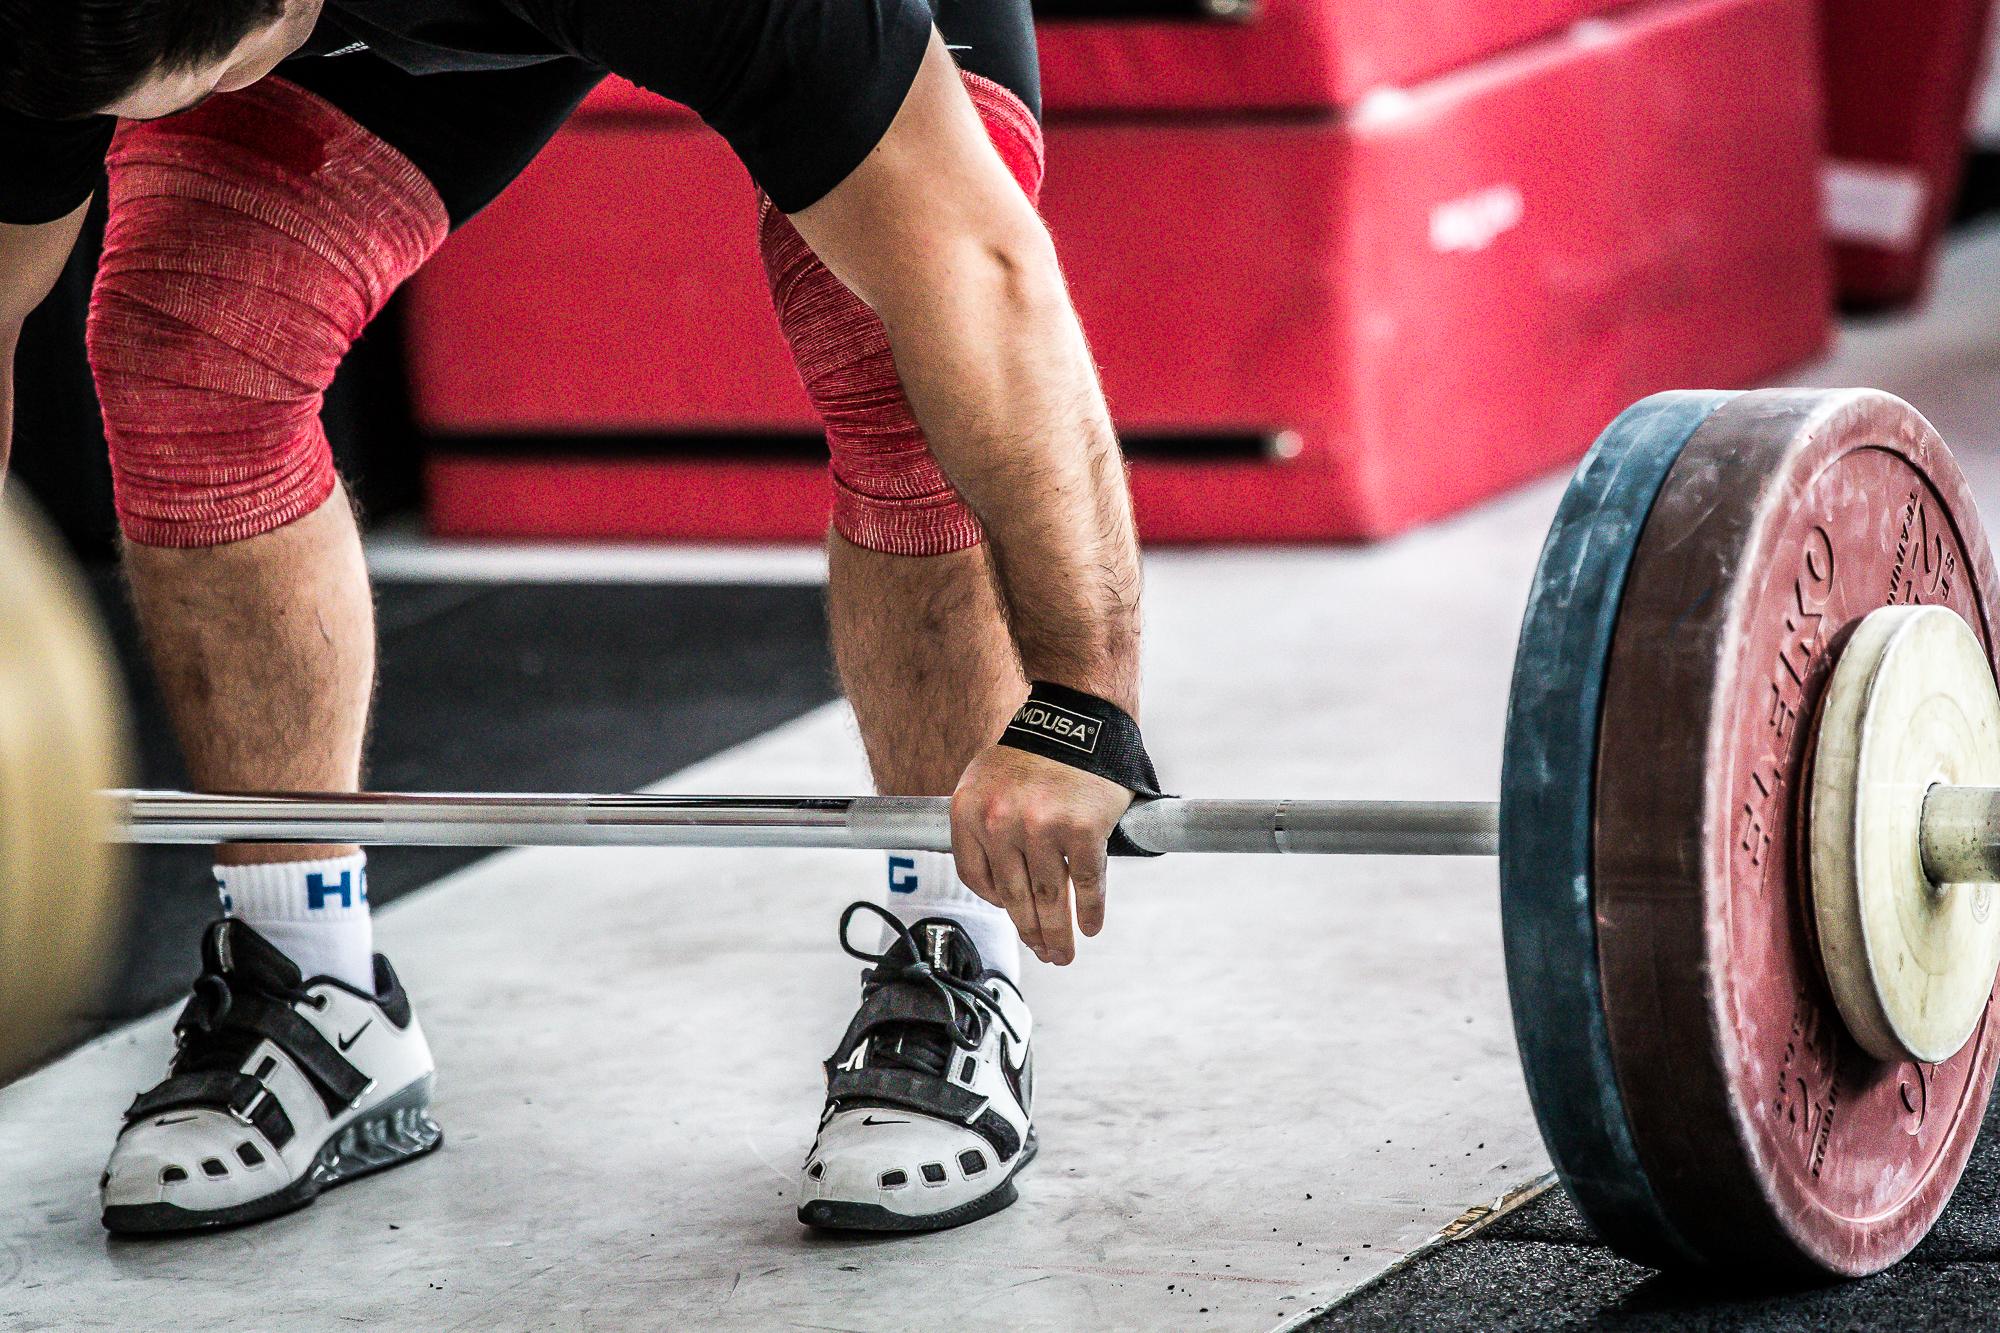 august-nywa-training-weightlifting-photos-by-everyday-lifters-viviana-podhaiski-12.jpg